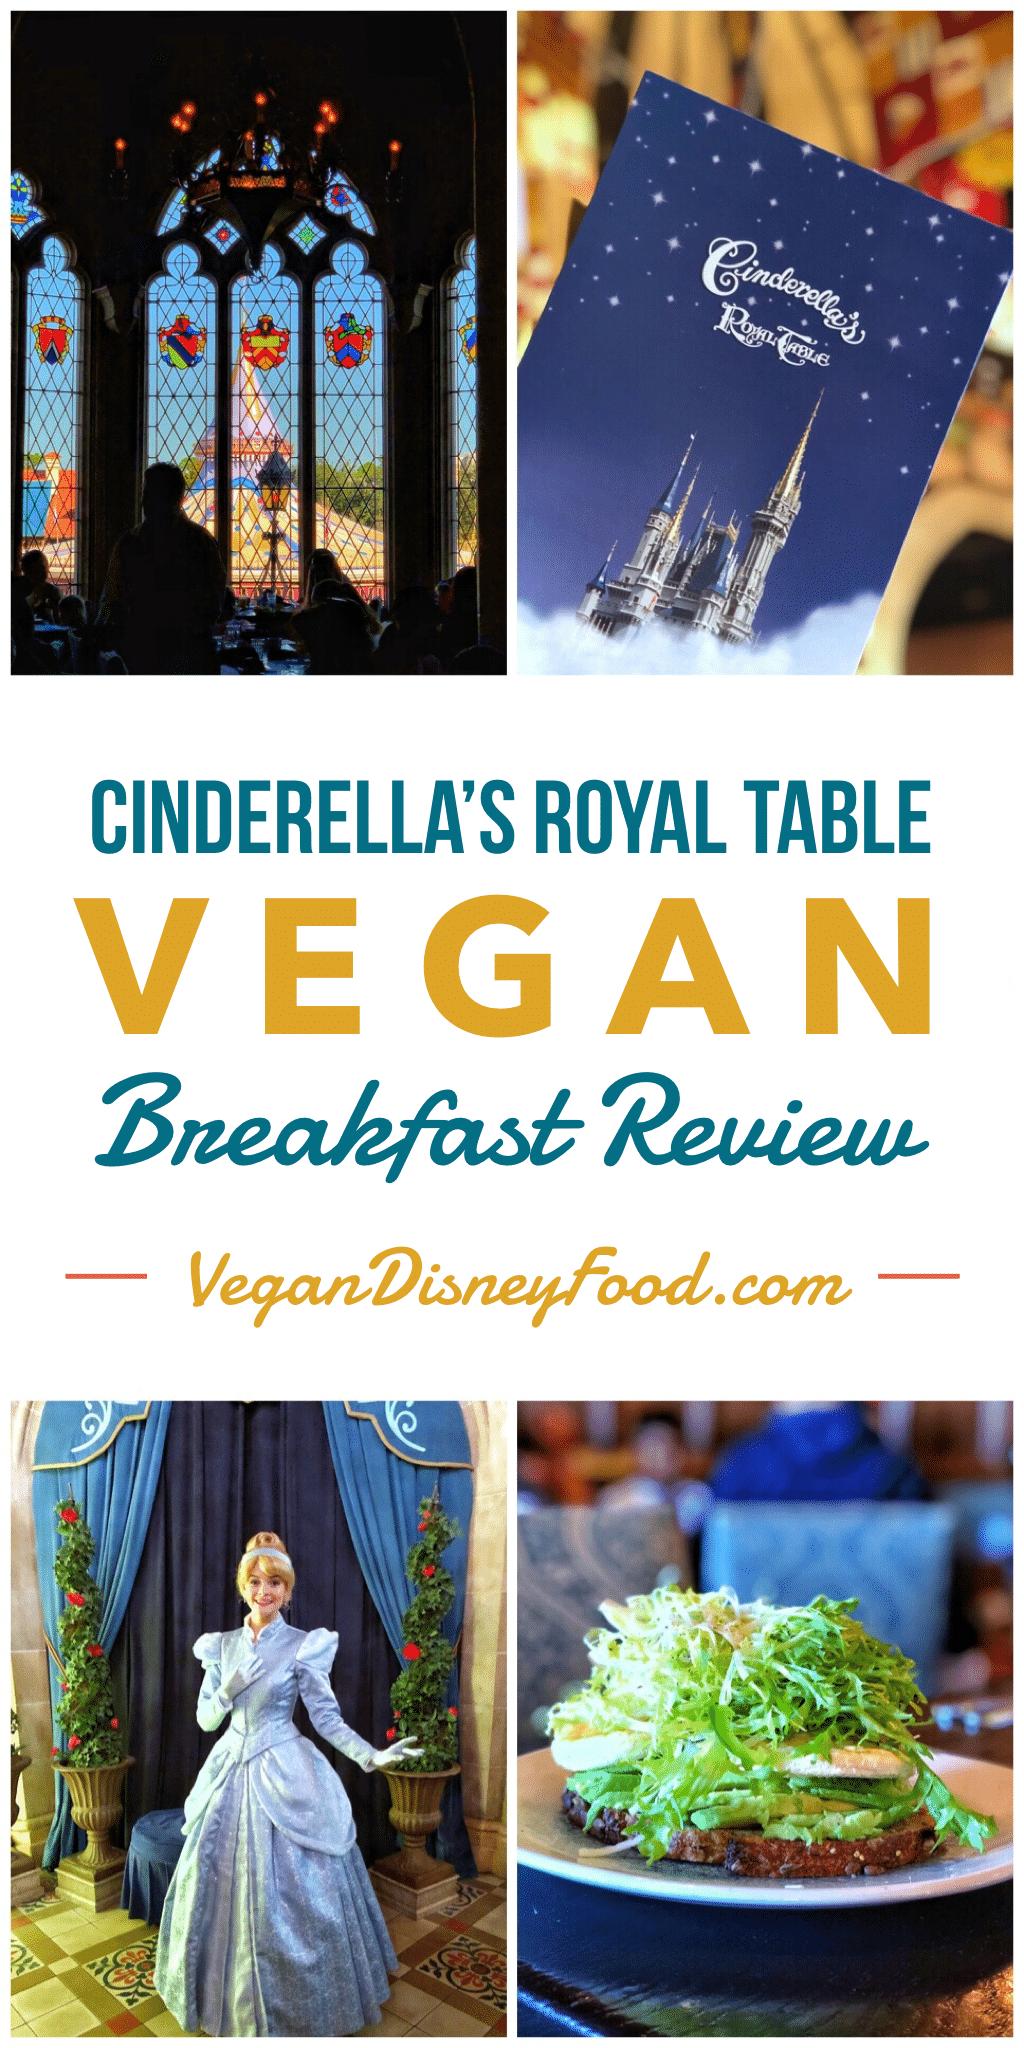 Cinderella's Royal Table Vegan Breakfast Review in the Magic Kingdom at Walt Disney World